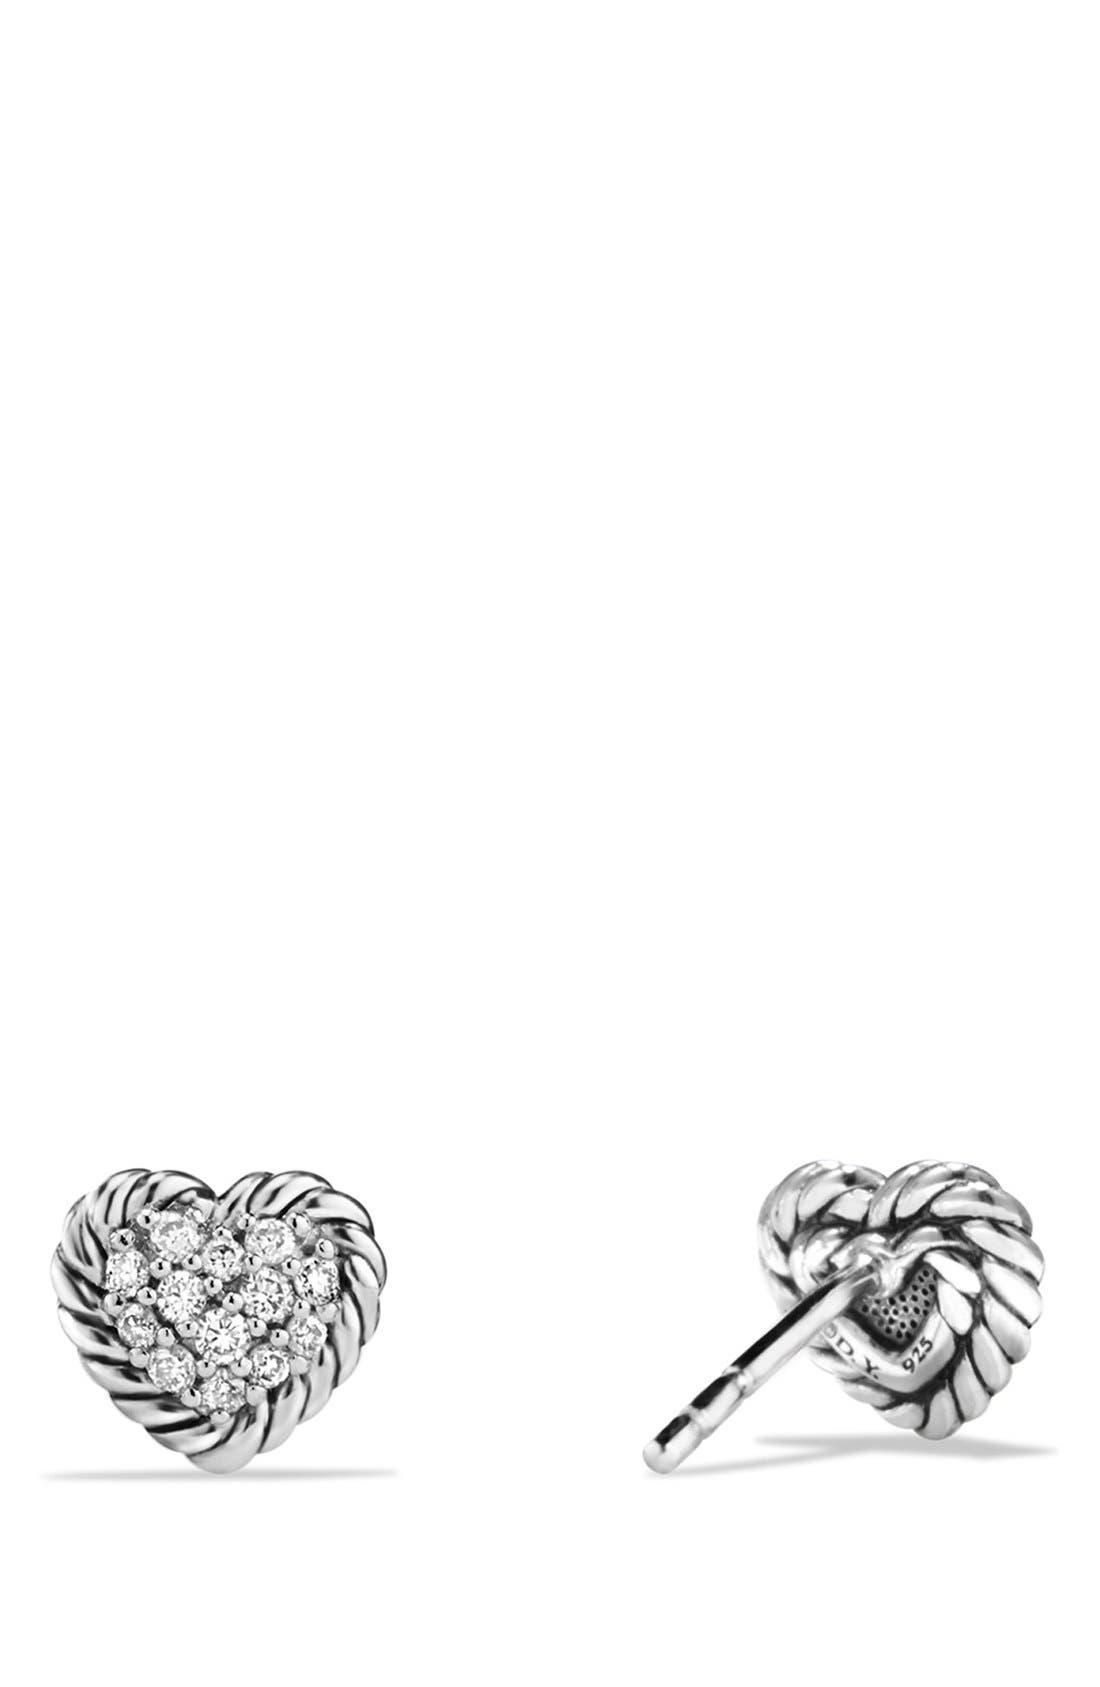 Alternate Image 2  - David Yurman 'Châtelaine' Heart Earrings with Diamonds